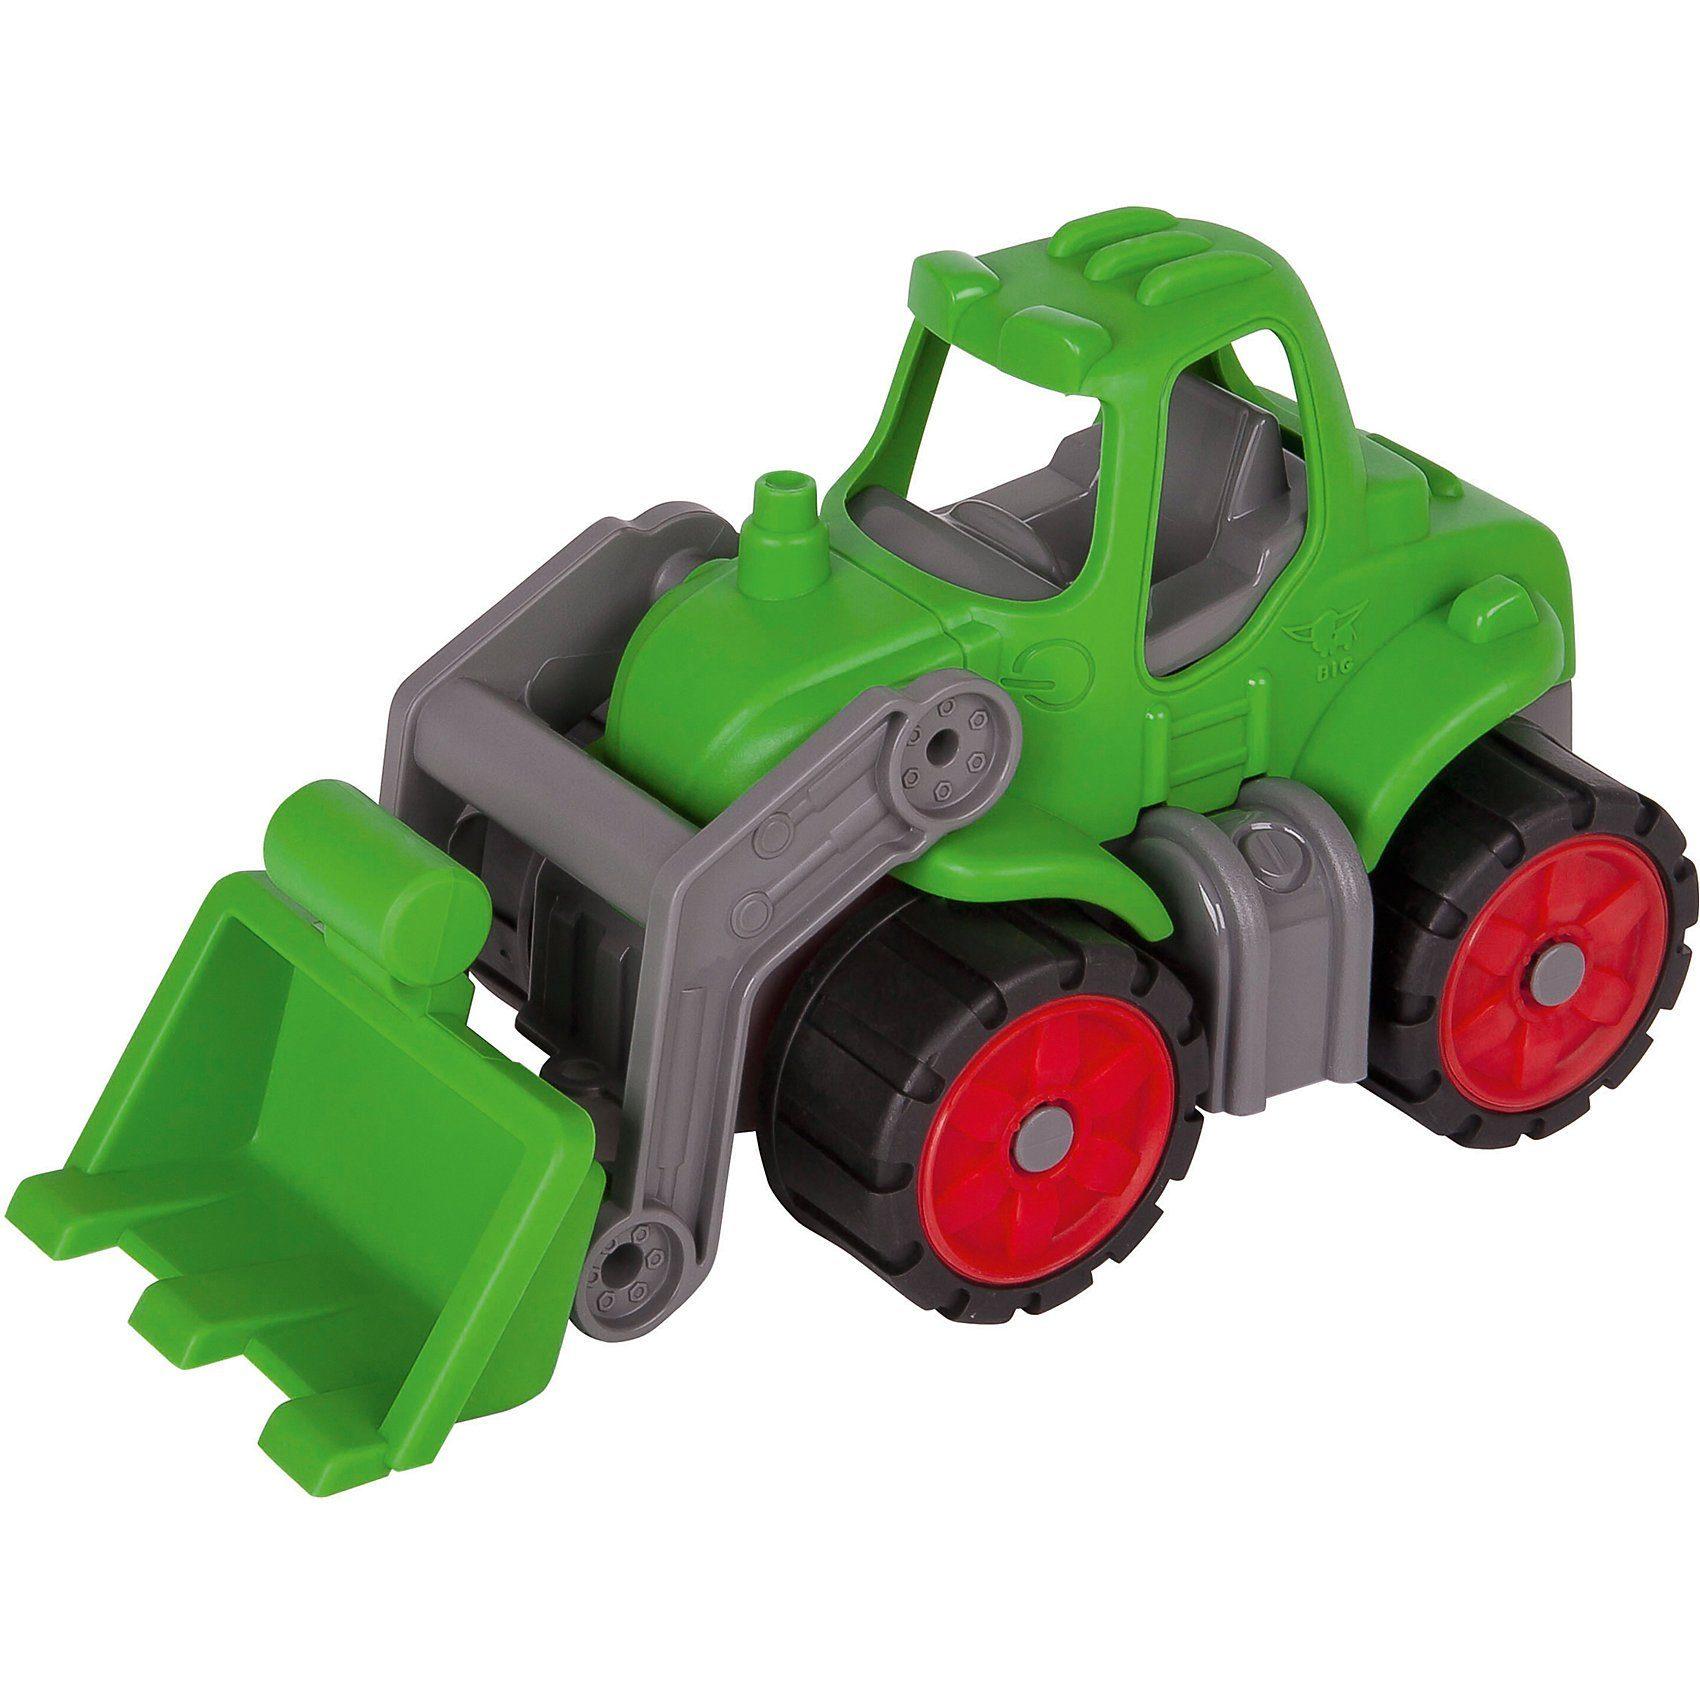 BIG Power Worker Mini Traktor, 23 cm